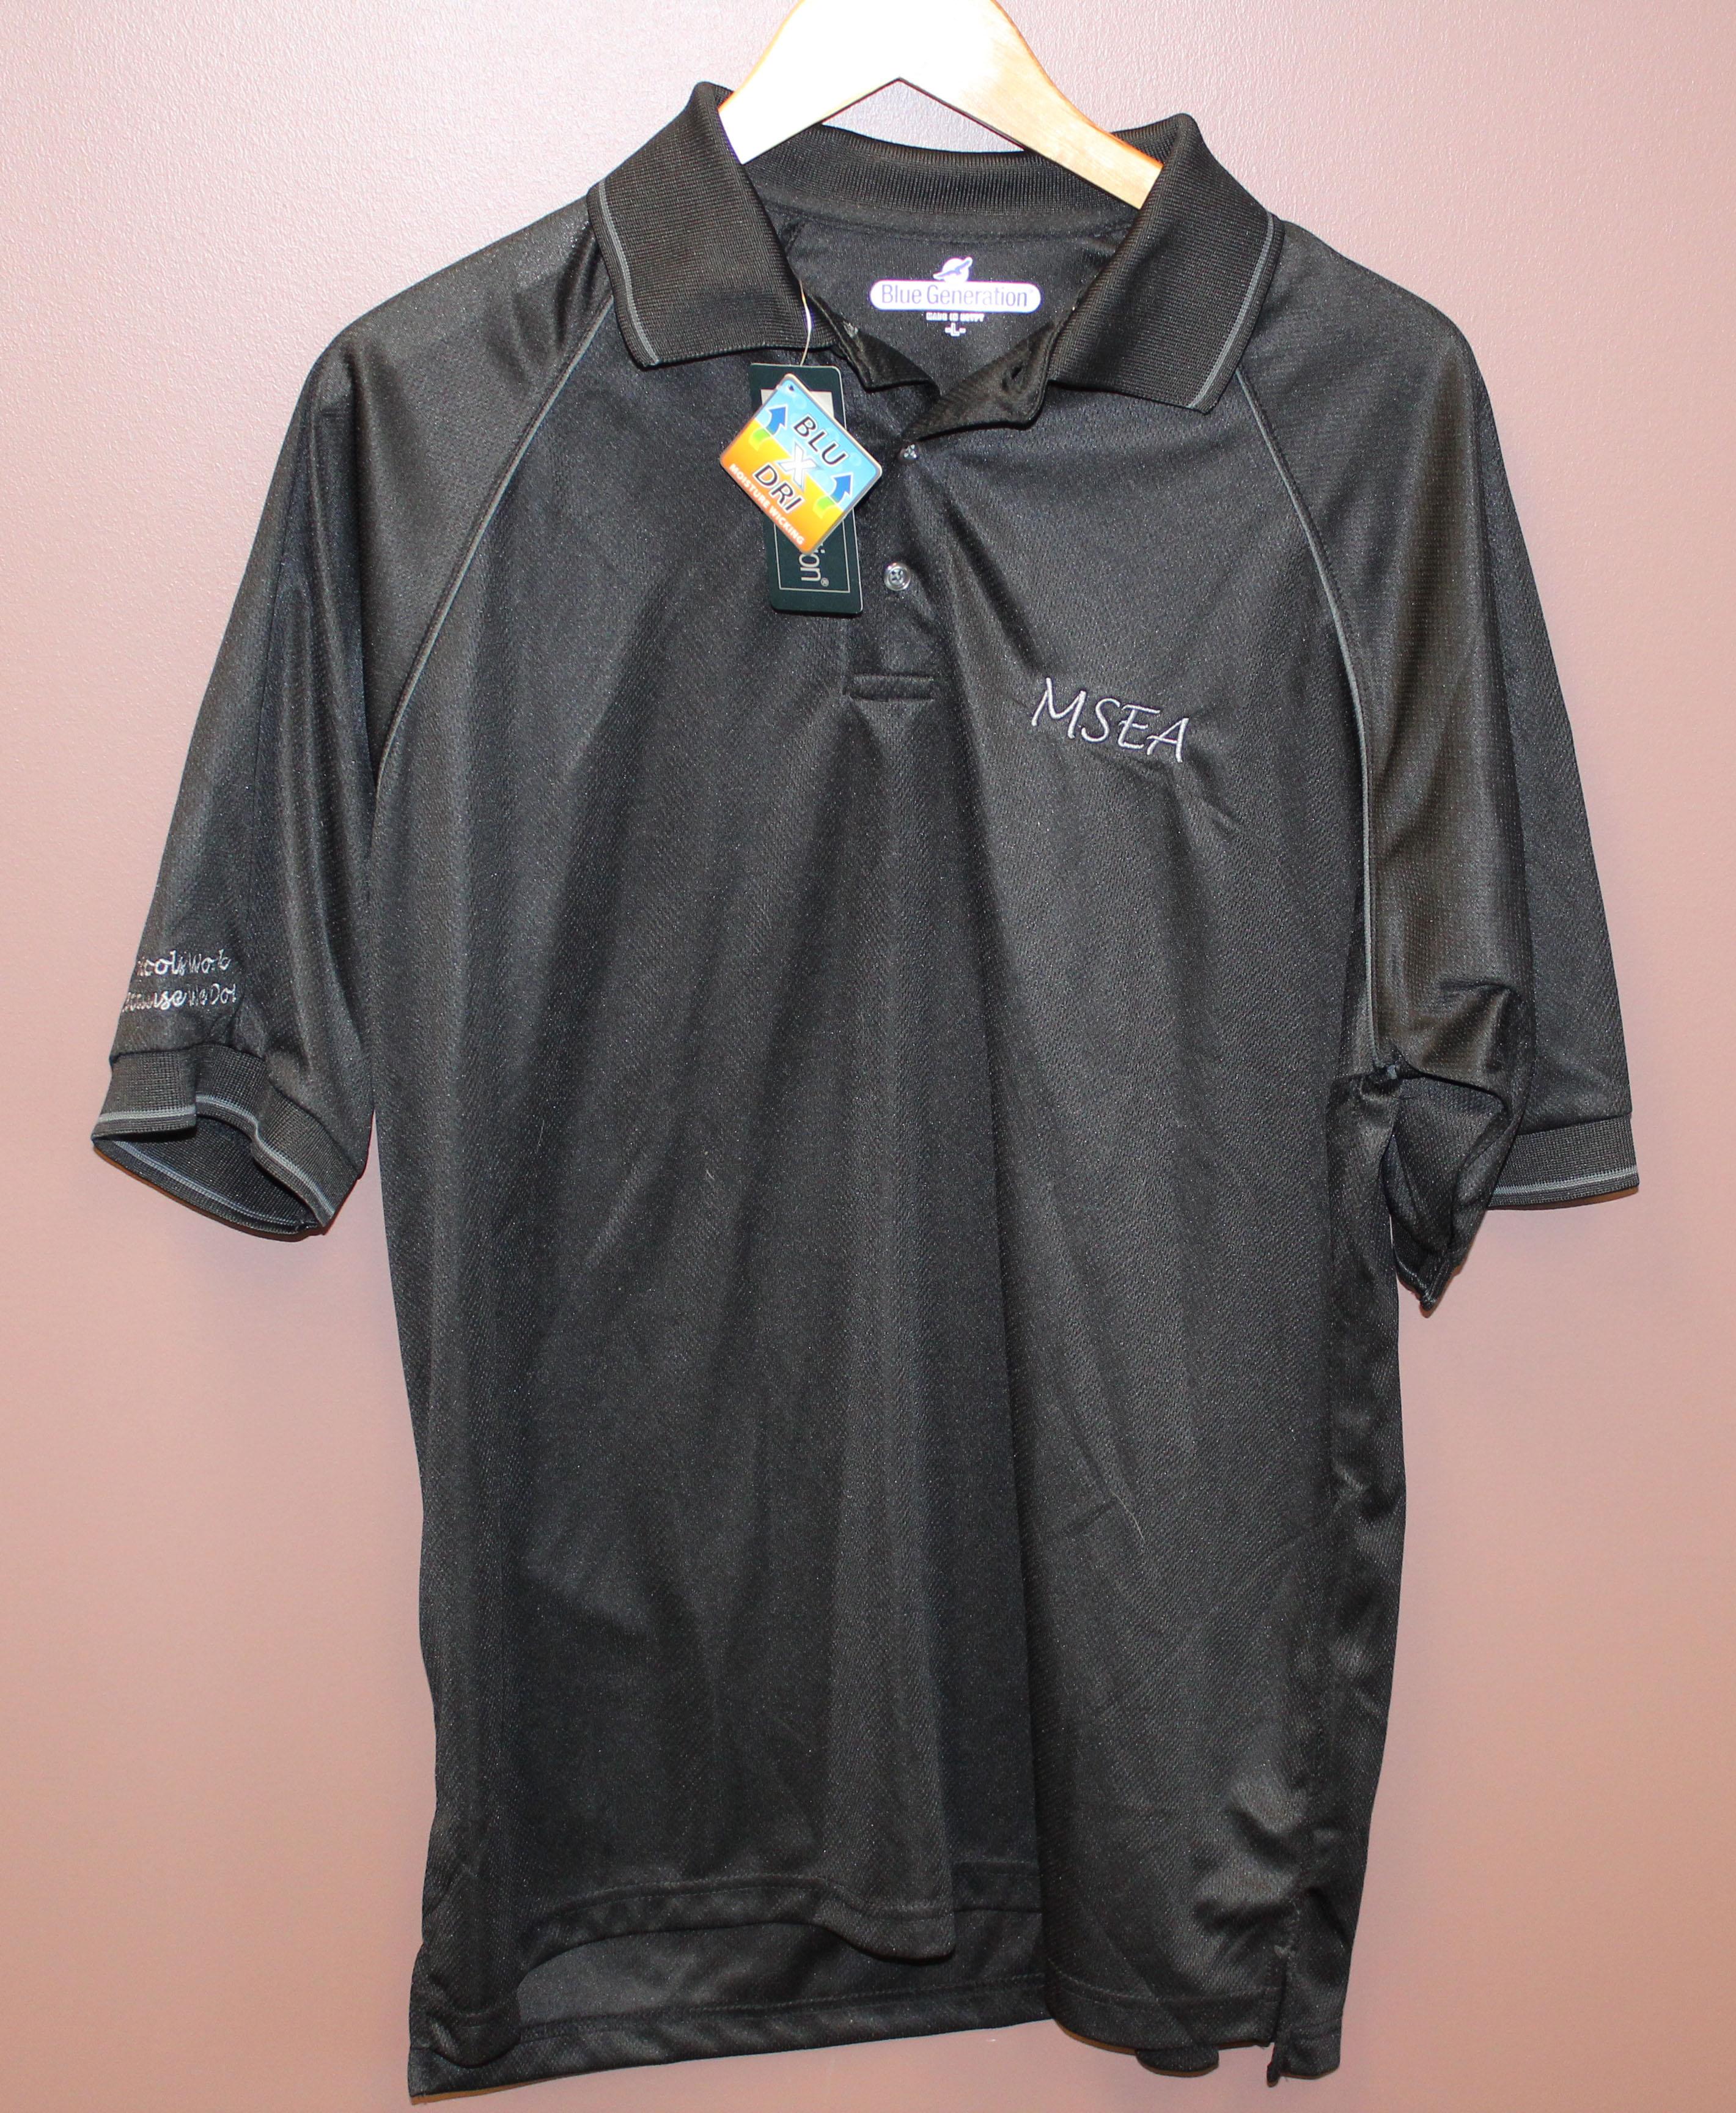 Black MSEA polo t-shirt